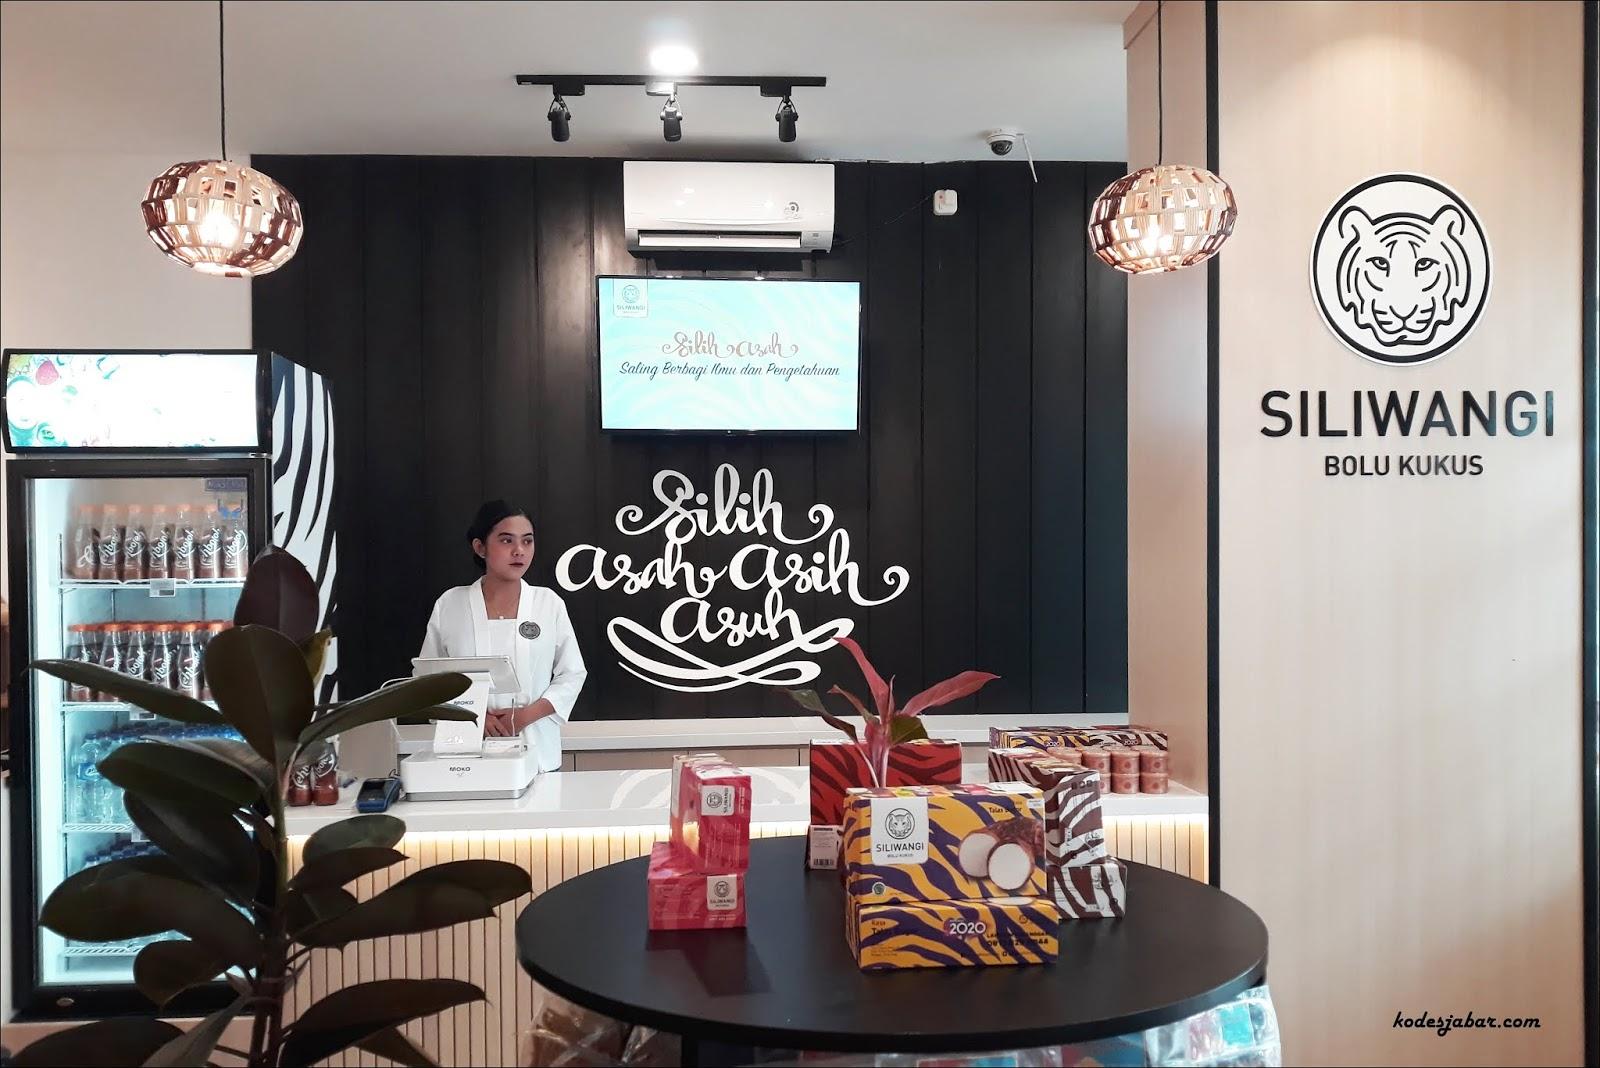 Store Resmi Siliwangi Bolu Kukus Kini Hadir di Bandung